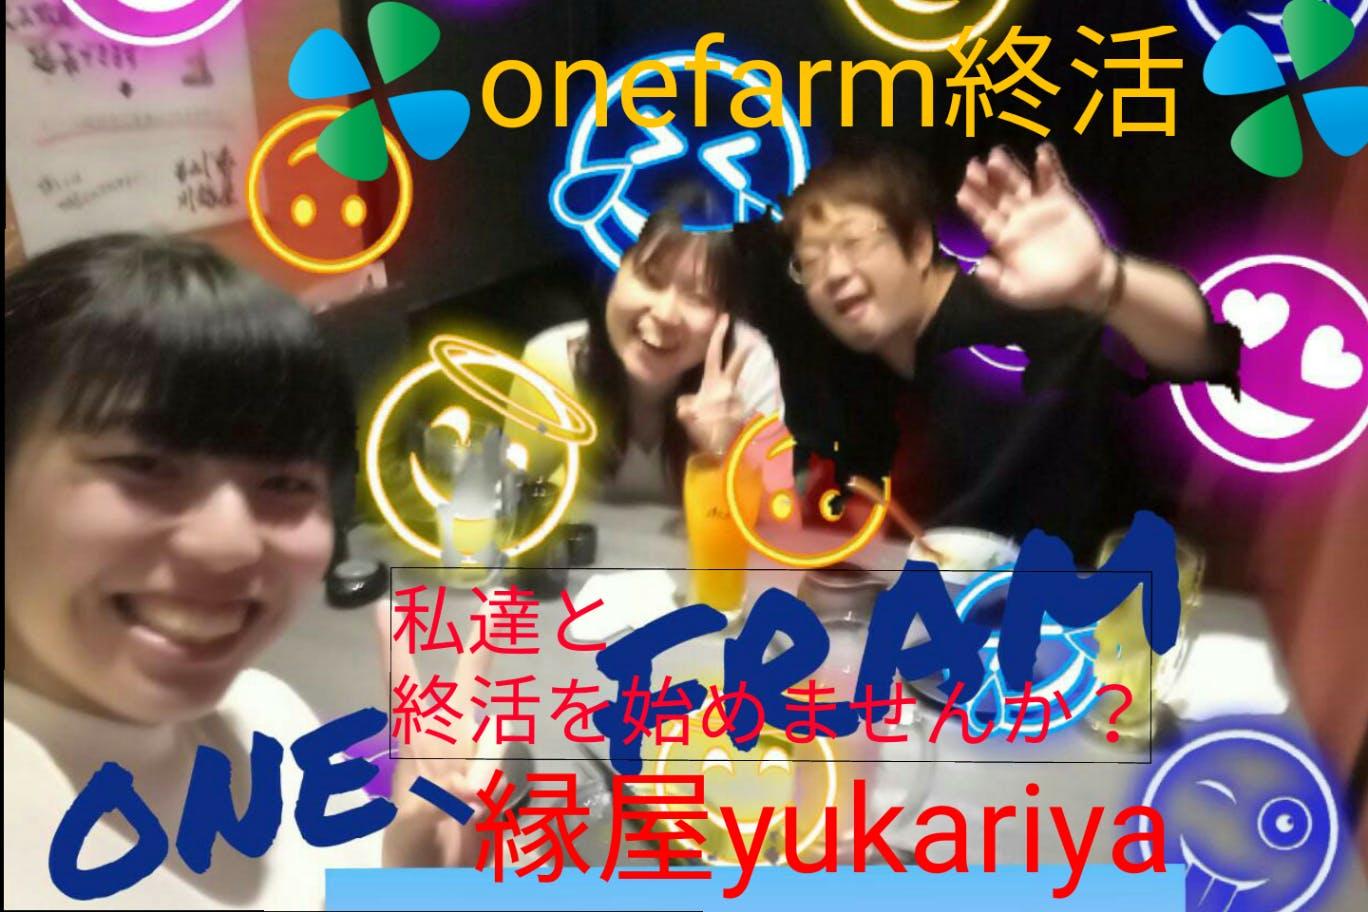 "<label class=""project-name"">onefarm終活「縁屋yukariya」を広めたい</label>"